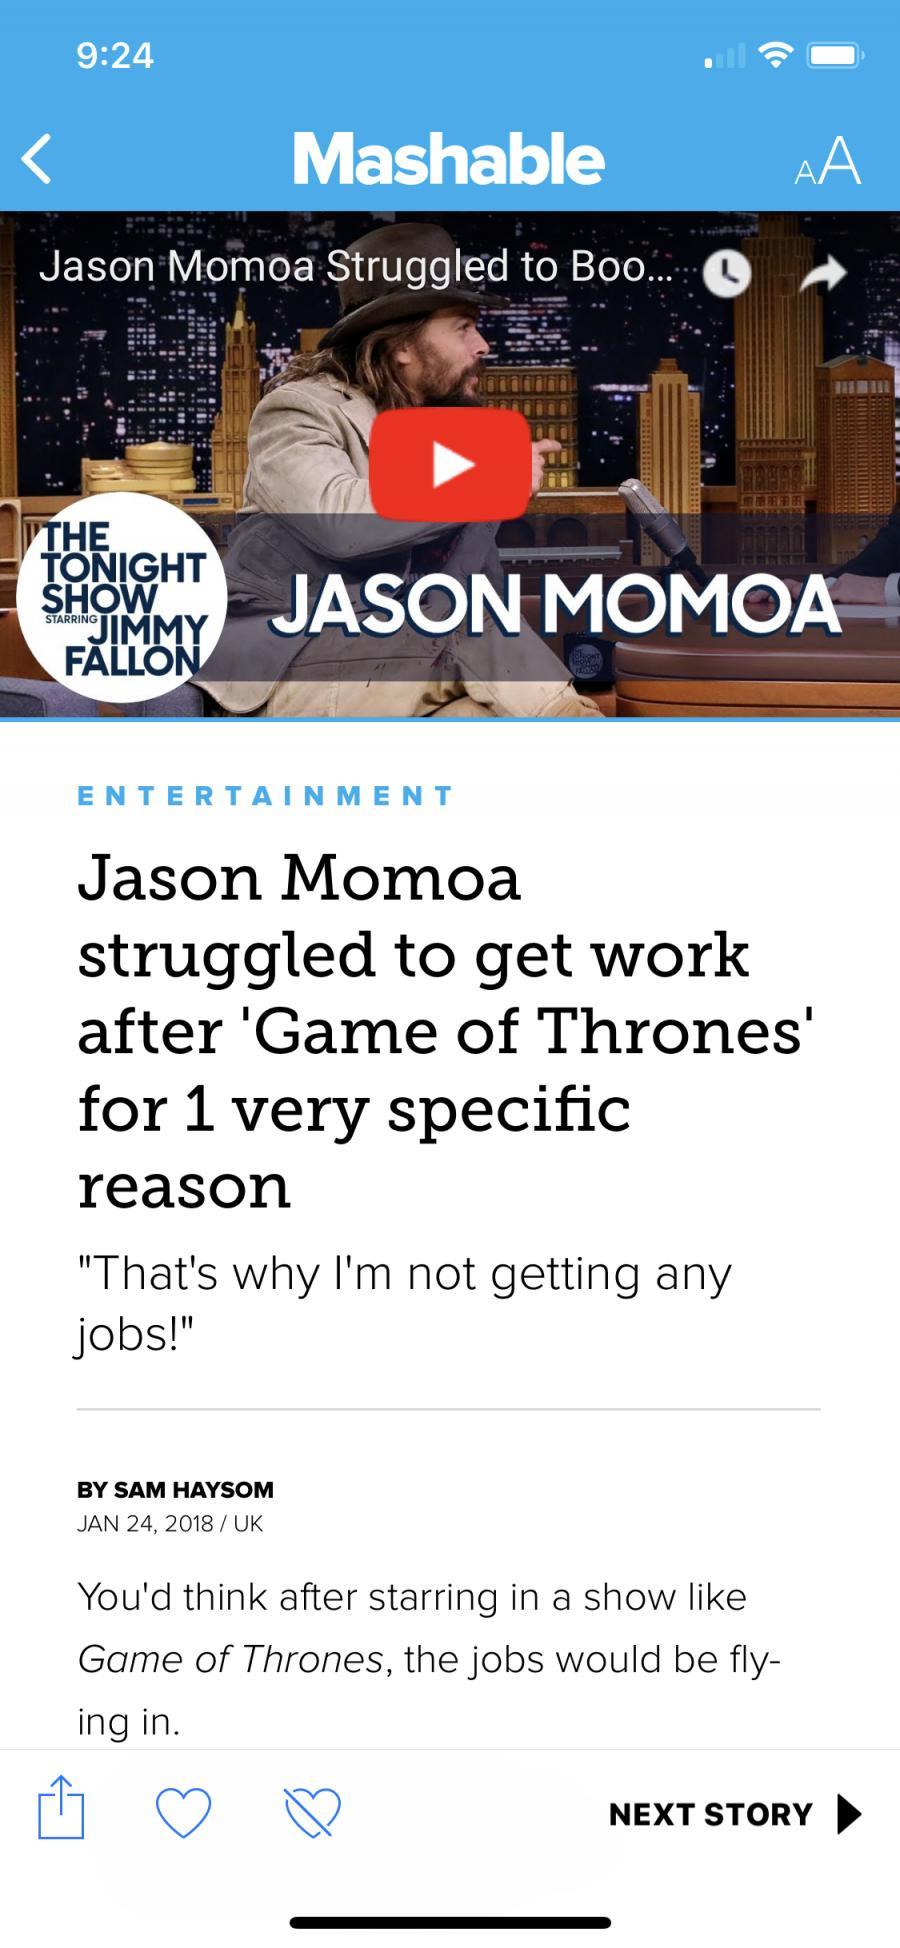 Mashable Media